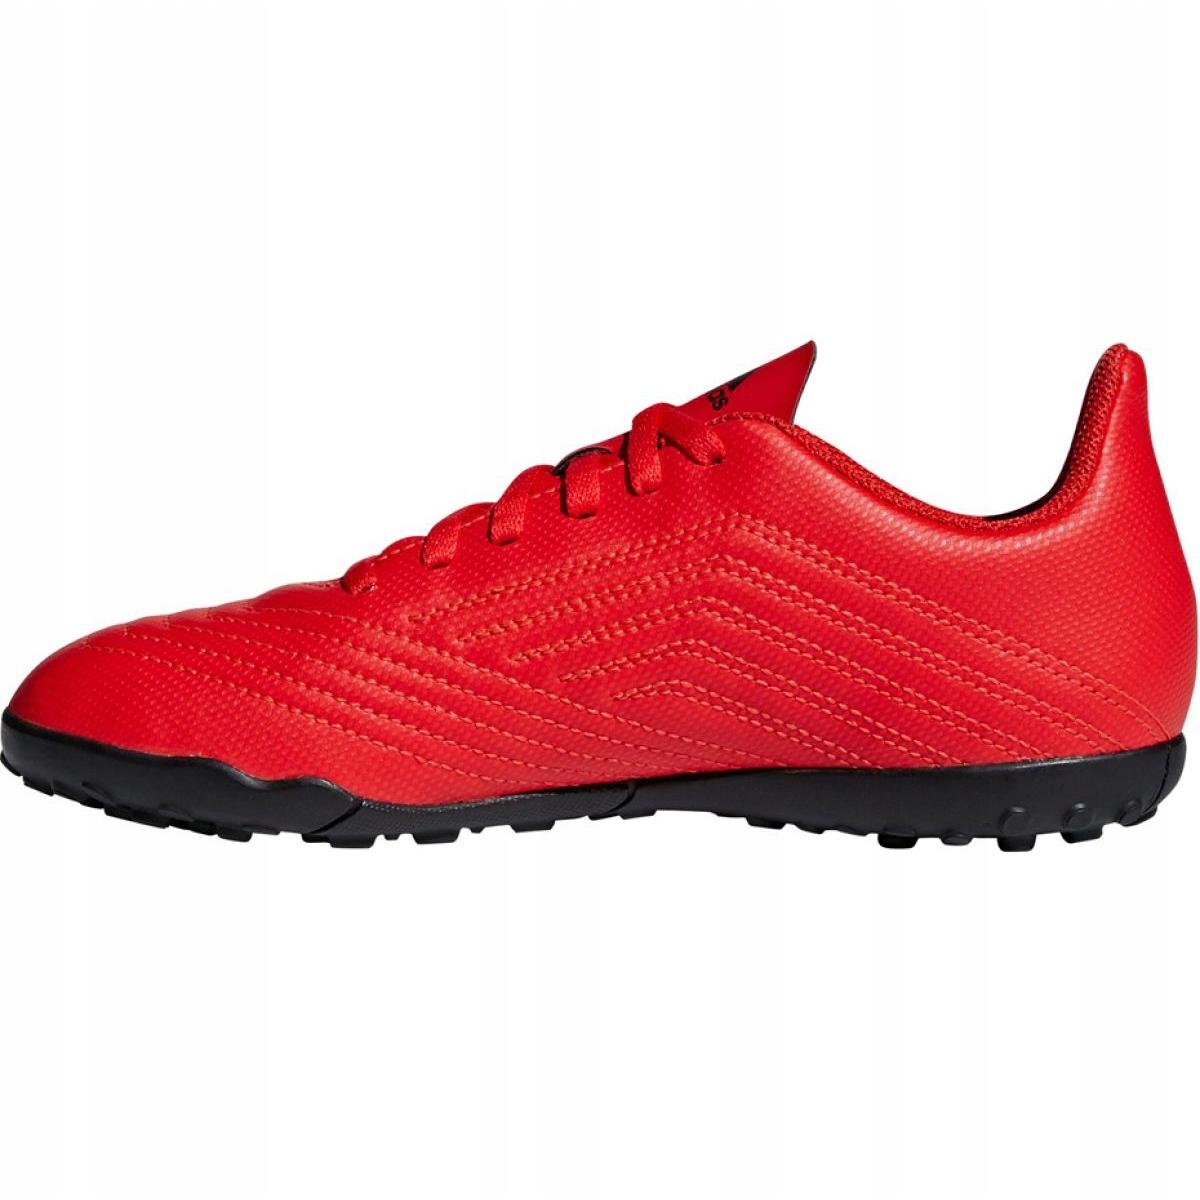 Predator Chaussures 4 Jr Cm8557 Foot 19 Adidas De Tf 5jRL3A4